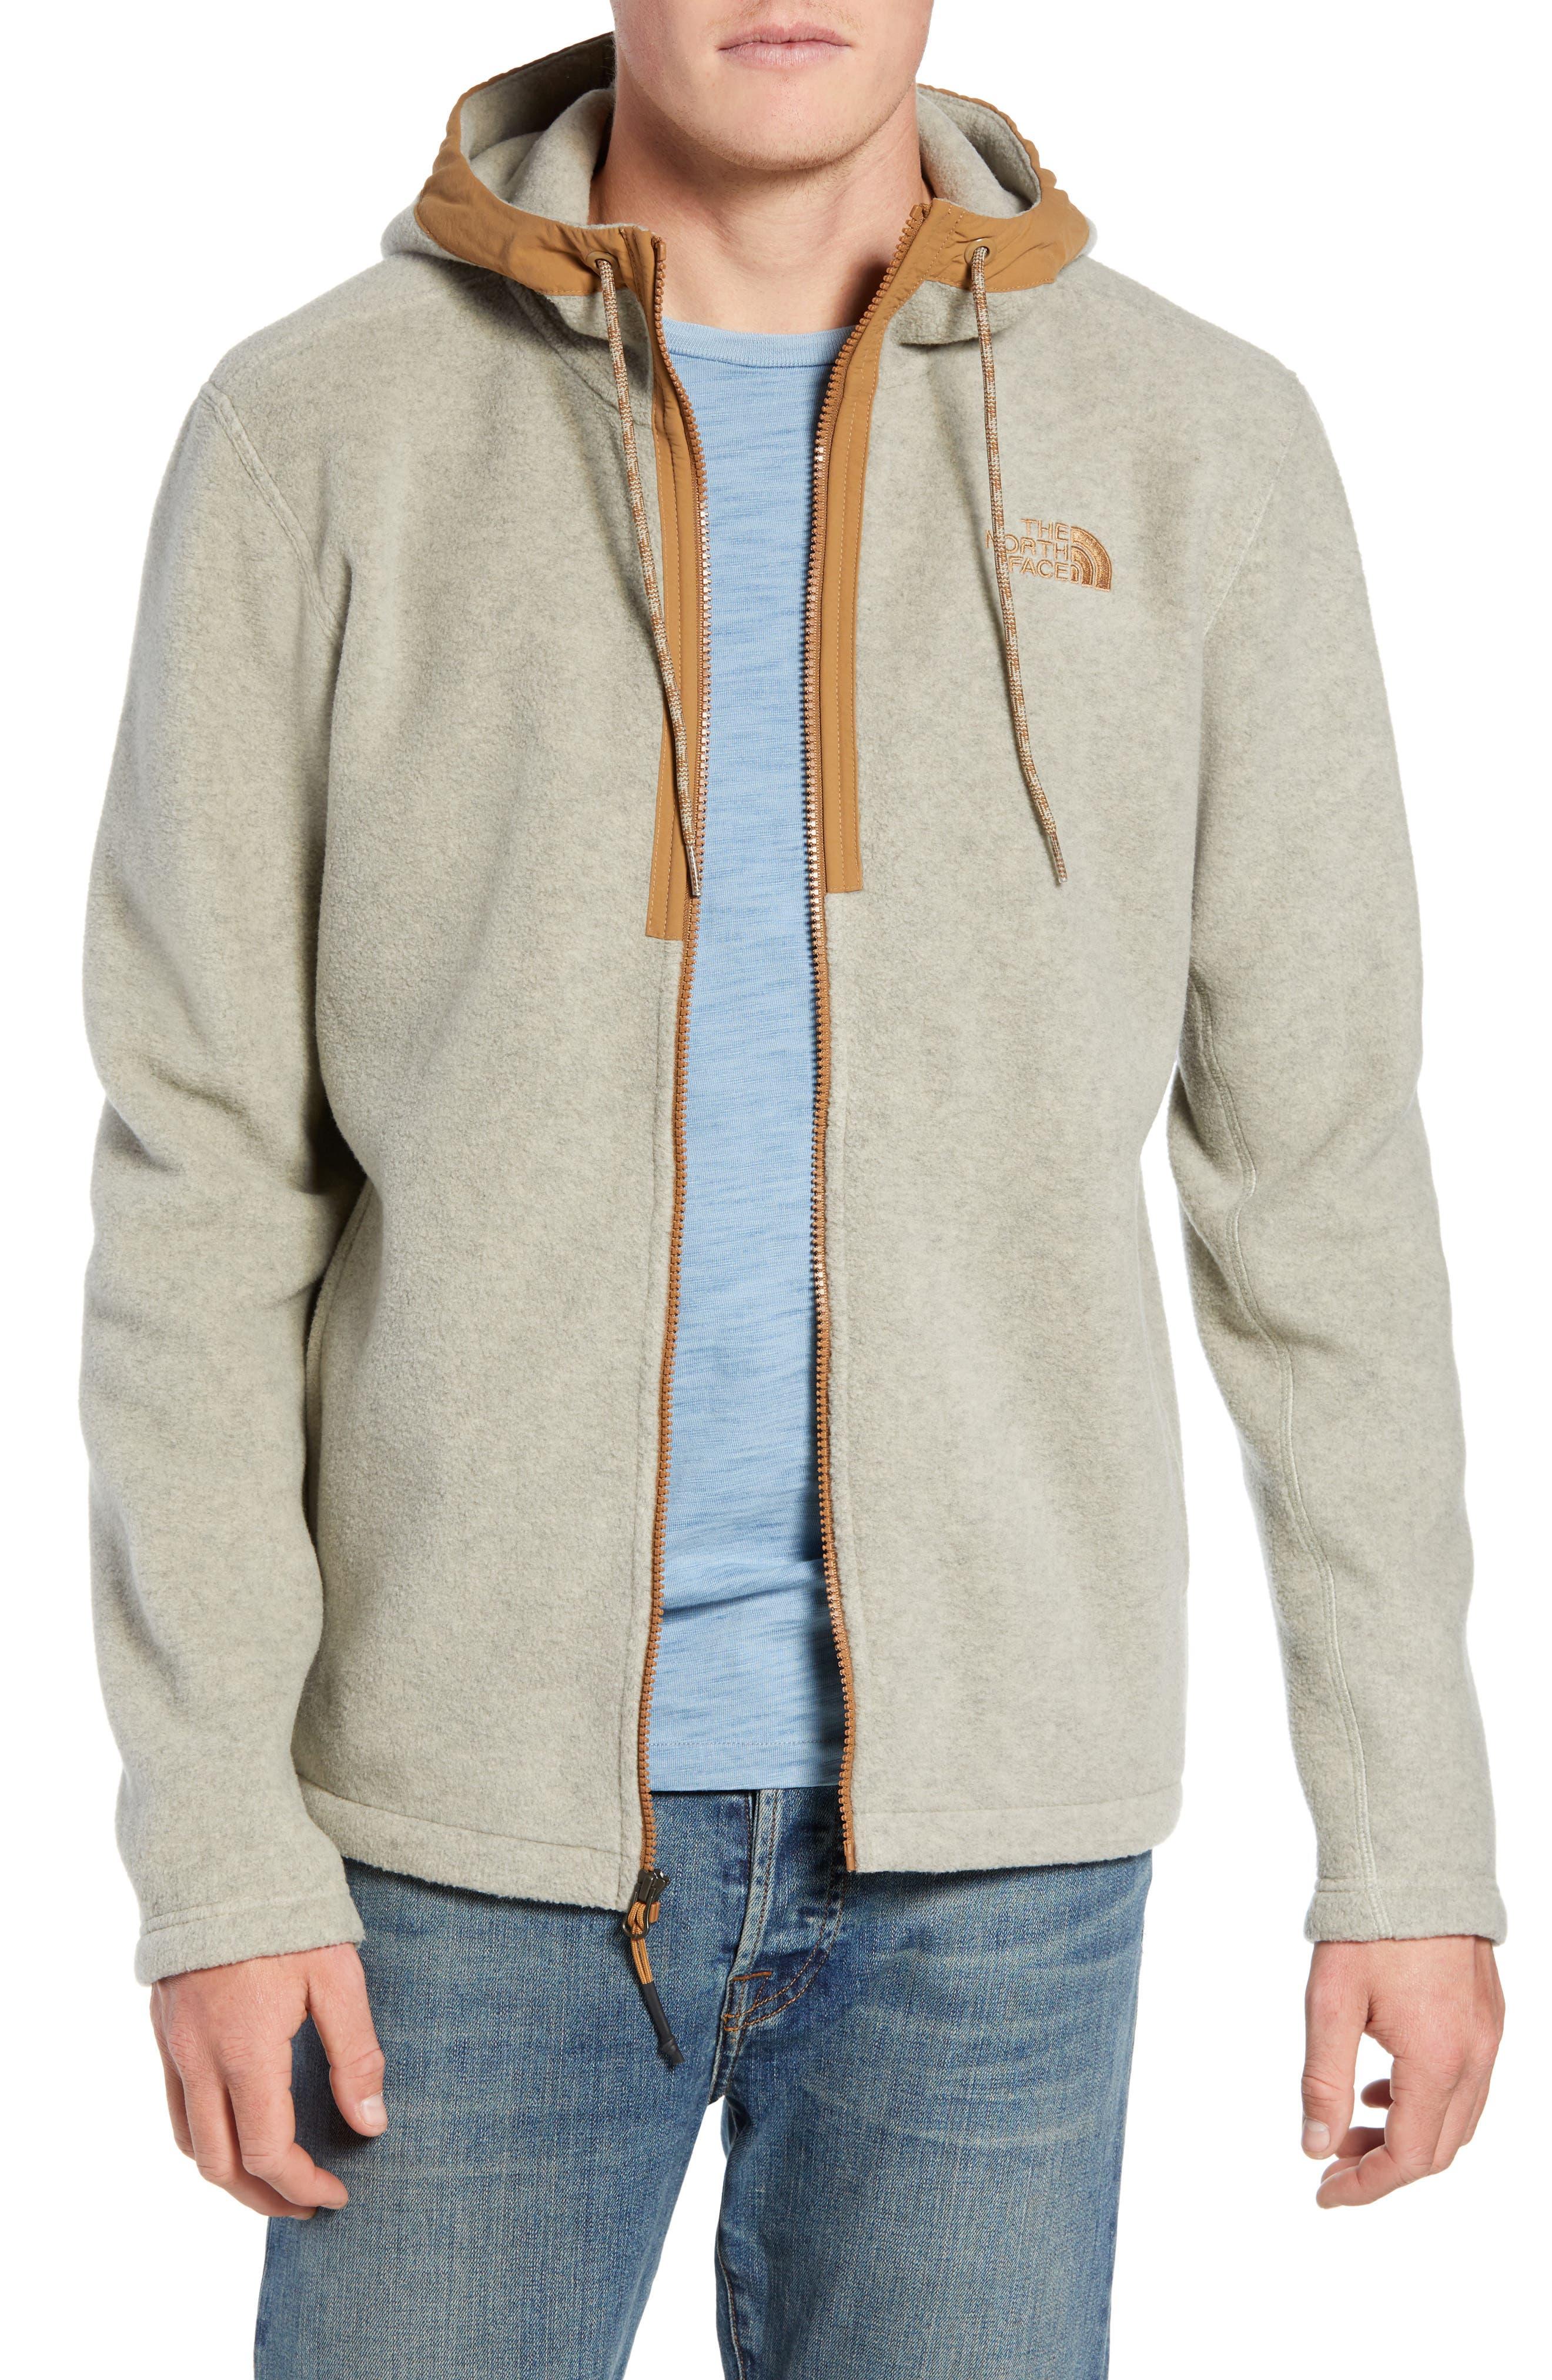 Pyrite Sweater Knit Fleece Hoodie,                         Main,                         color, GRANITE BLUFF TAN HEATHER